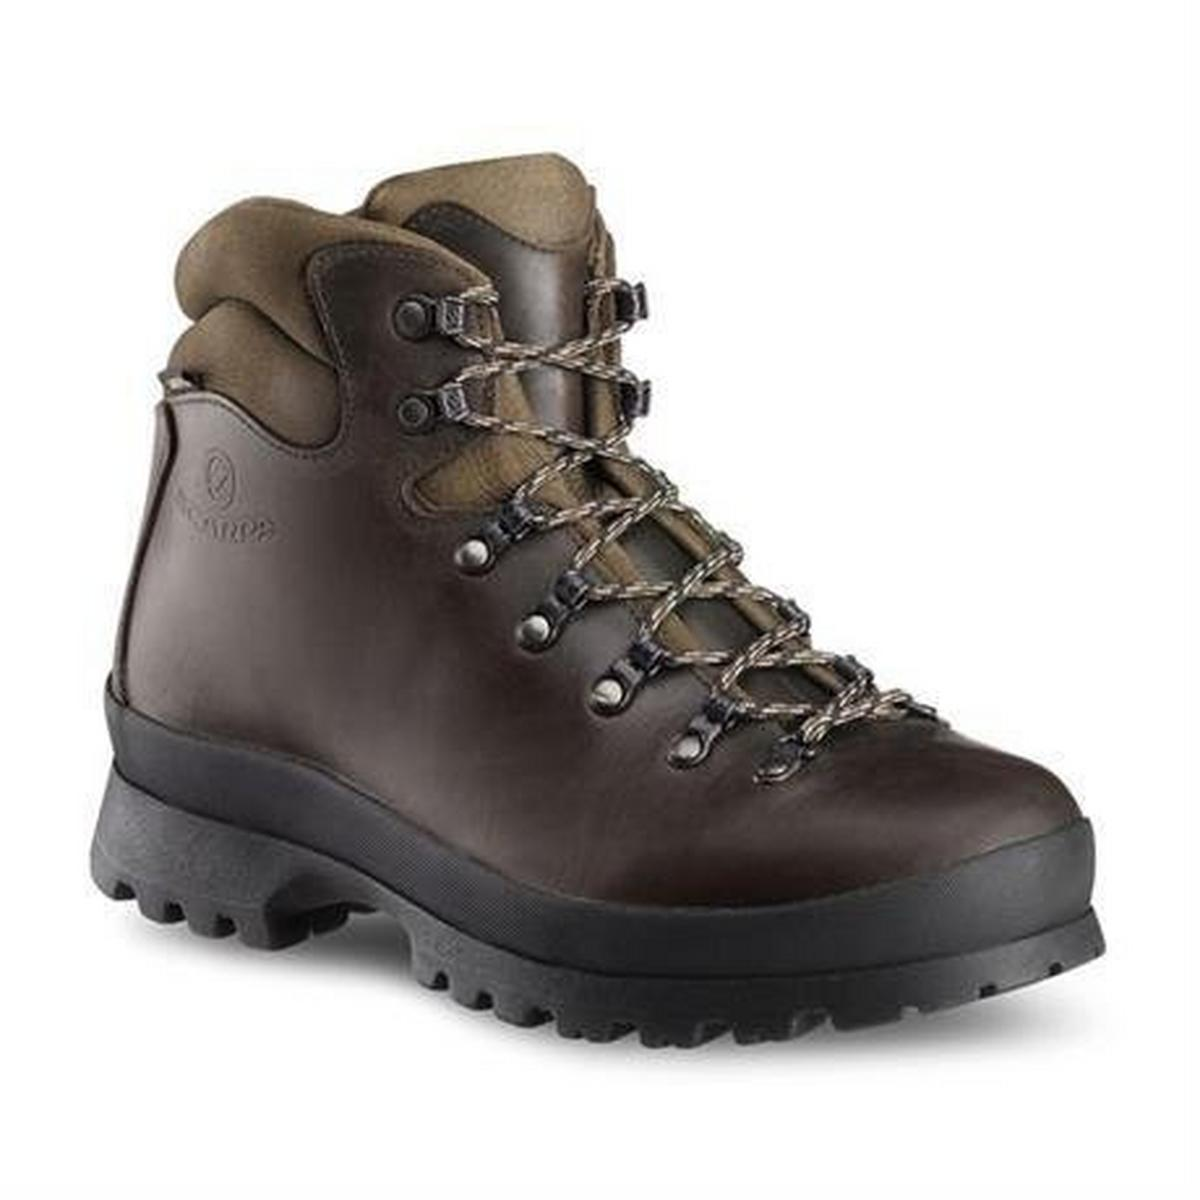 Scarpa Men's Scarpa Ranger Activ GTX Boots - Grey